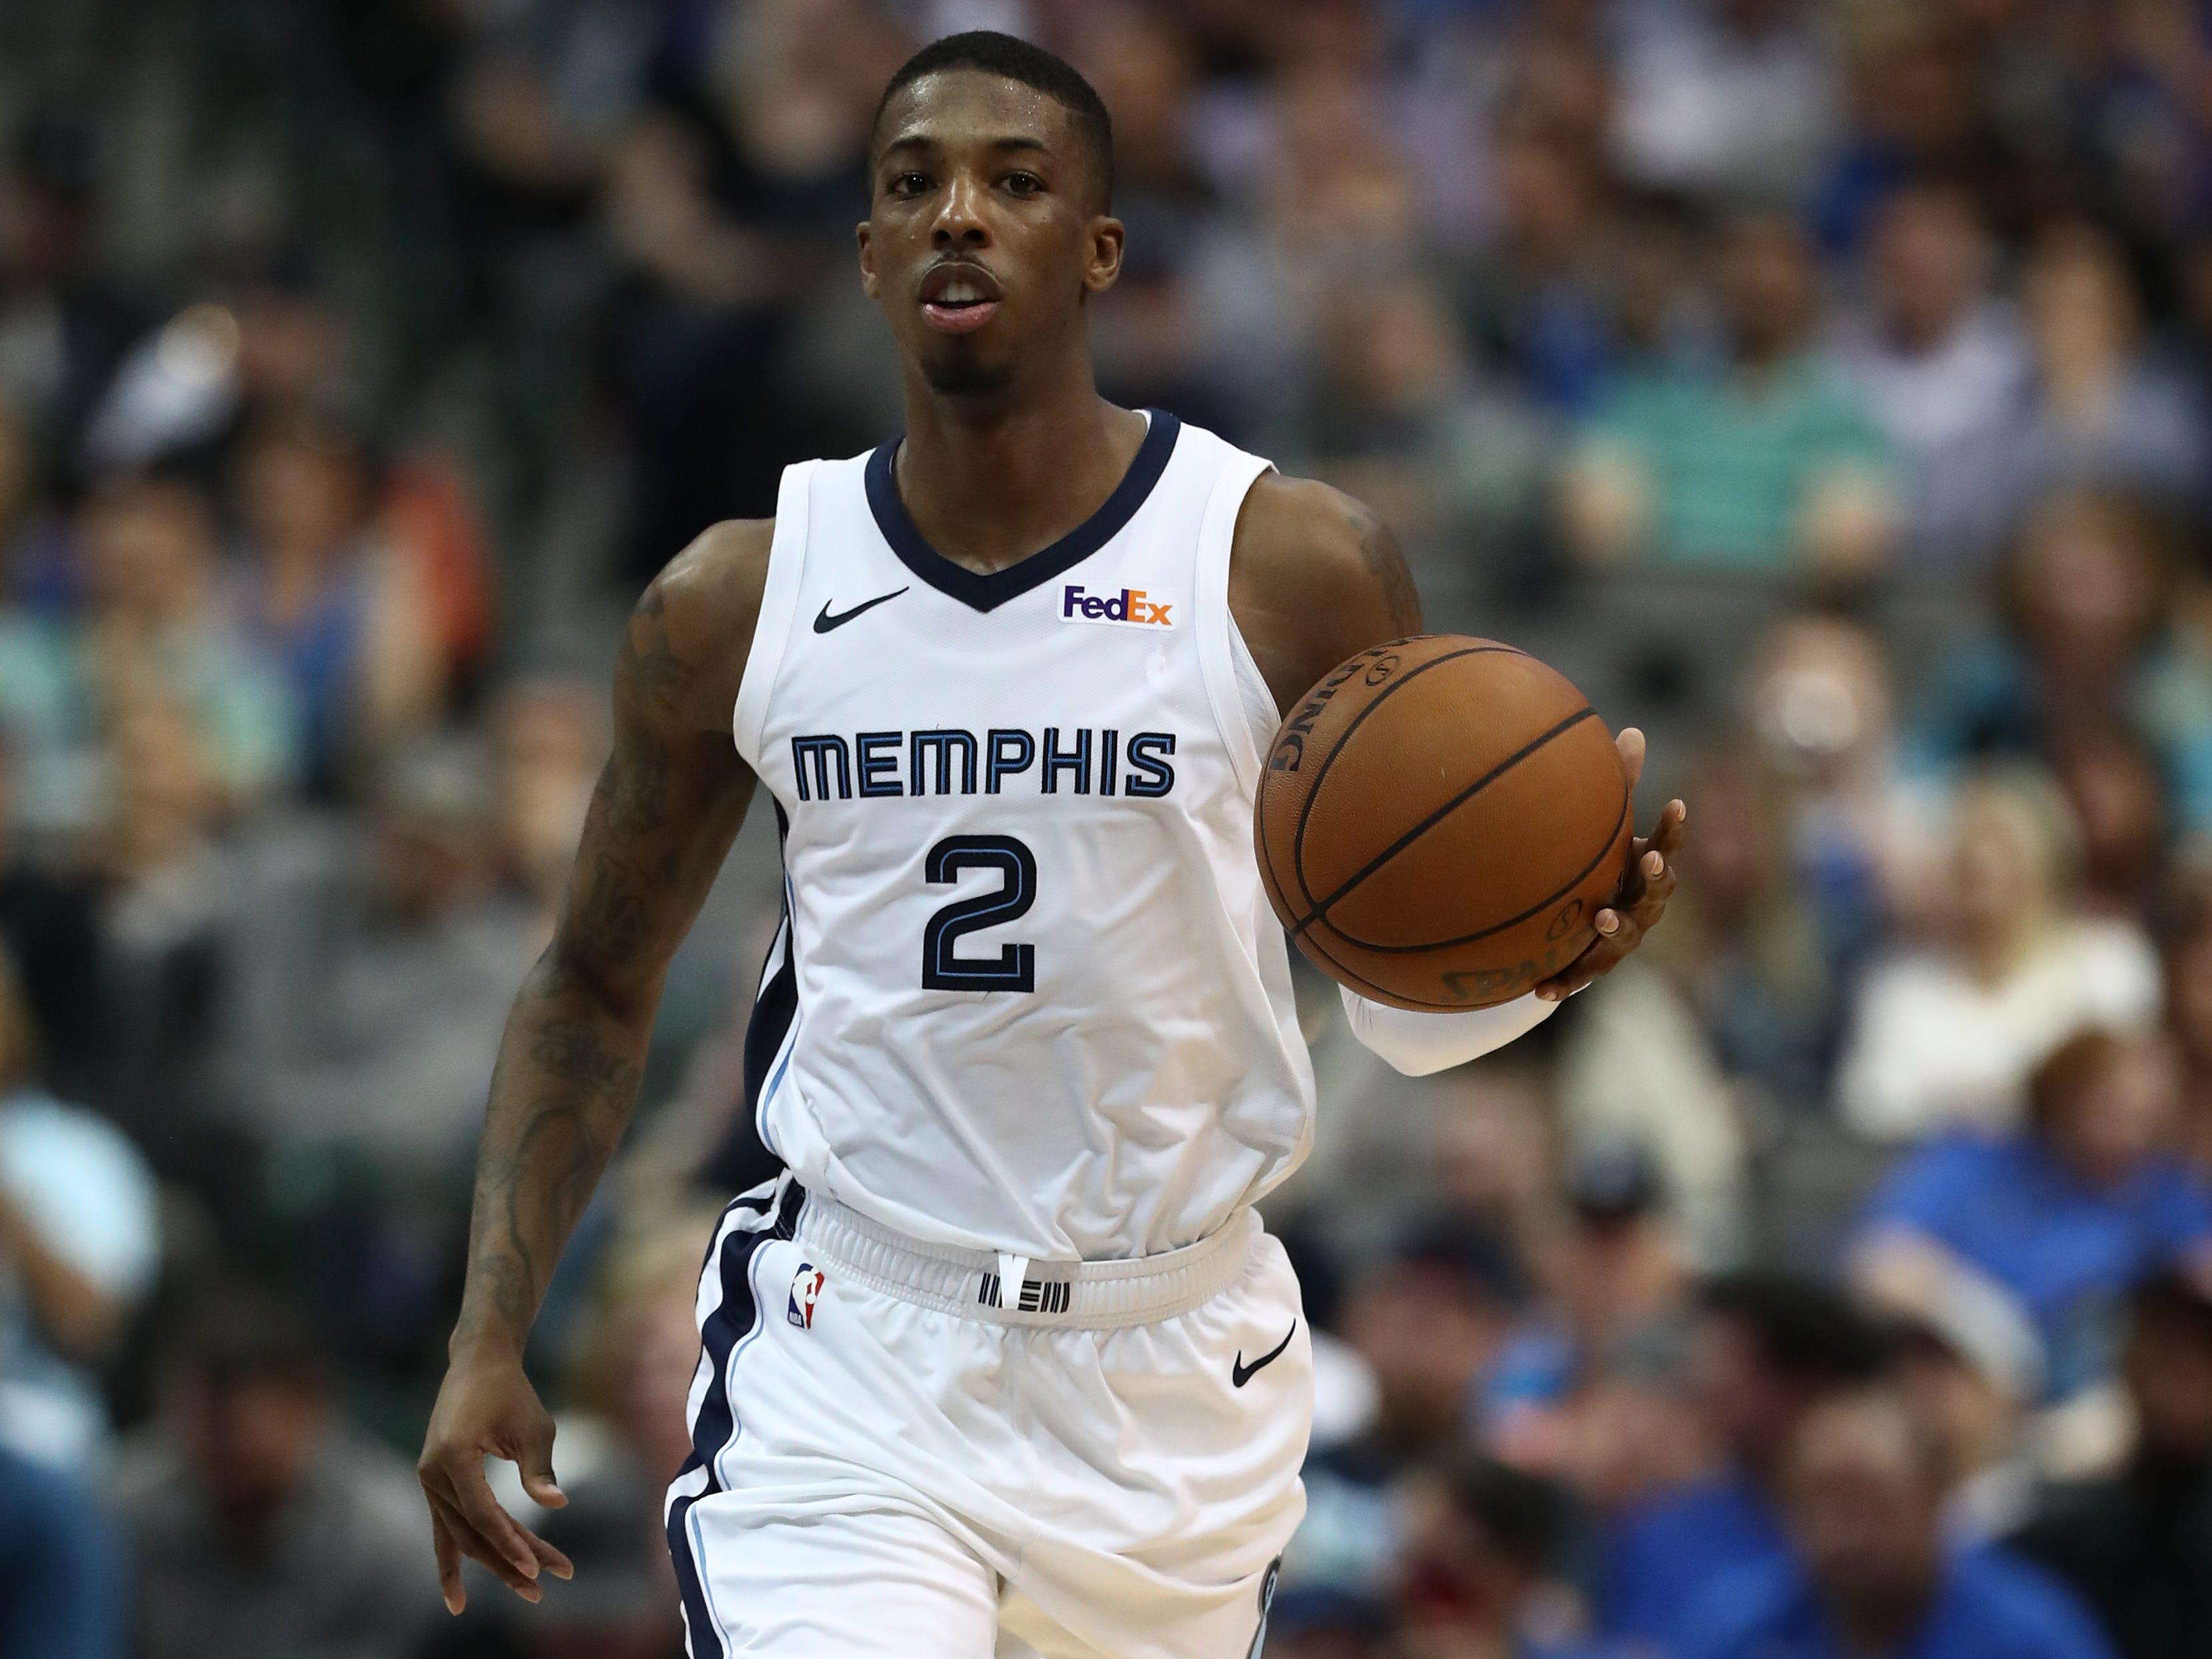 120. Delon Wright, Grizzlies (April 5): 26 points, 14 assist, 10 rebounds in 122-112 win over Mavericks.